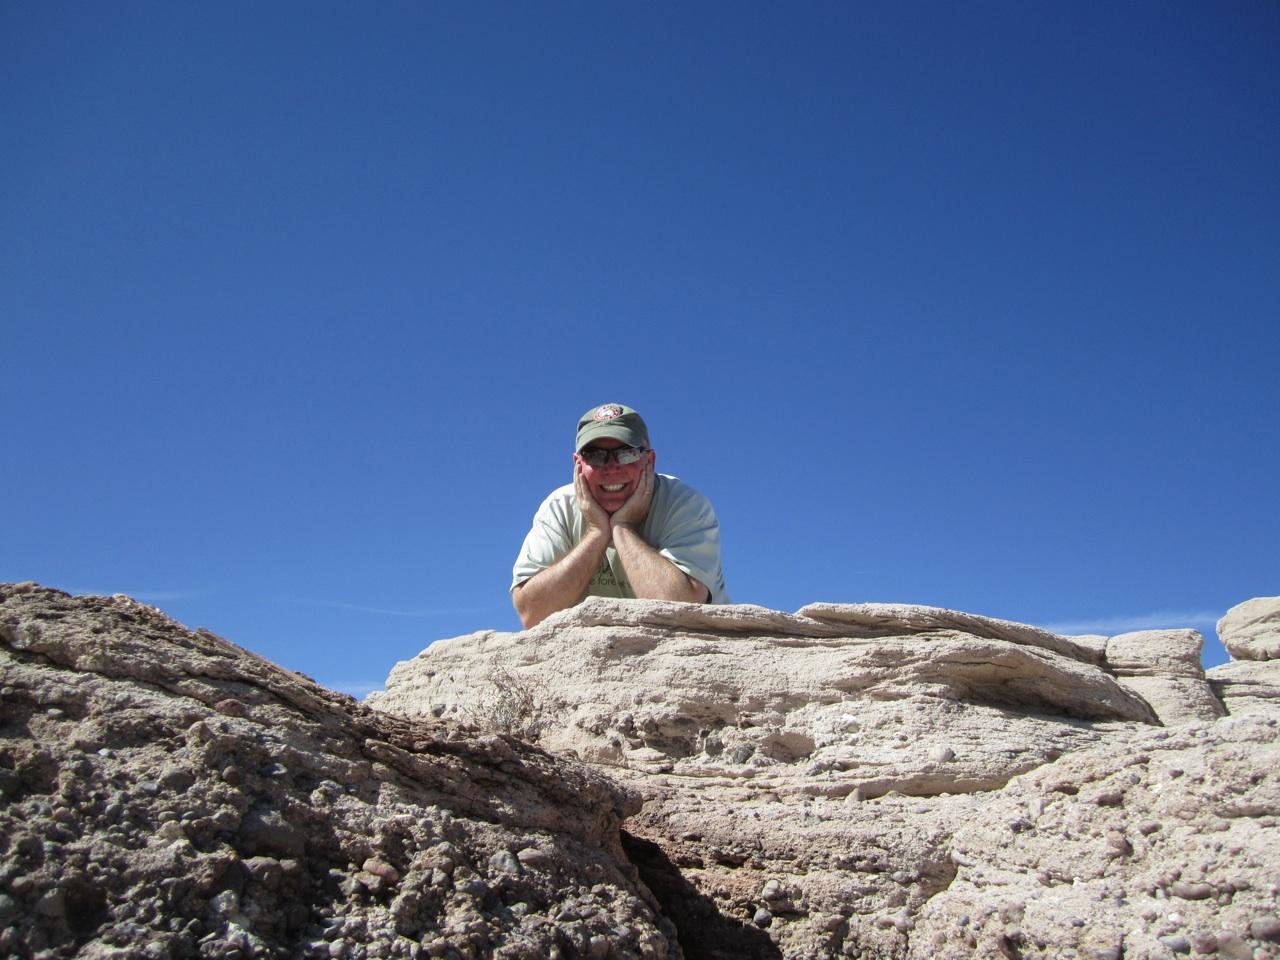 David Enjoying The View On The Blue Mesa Trail